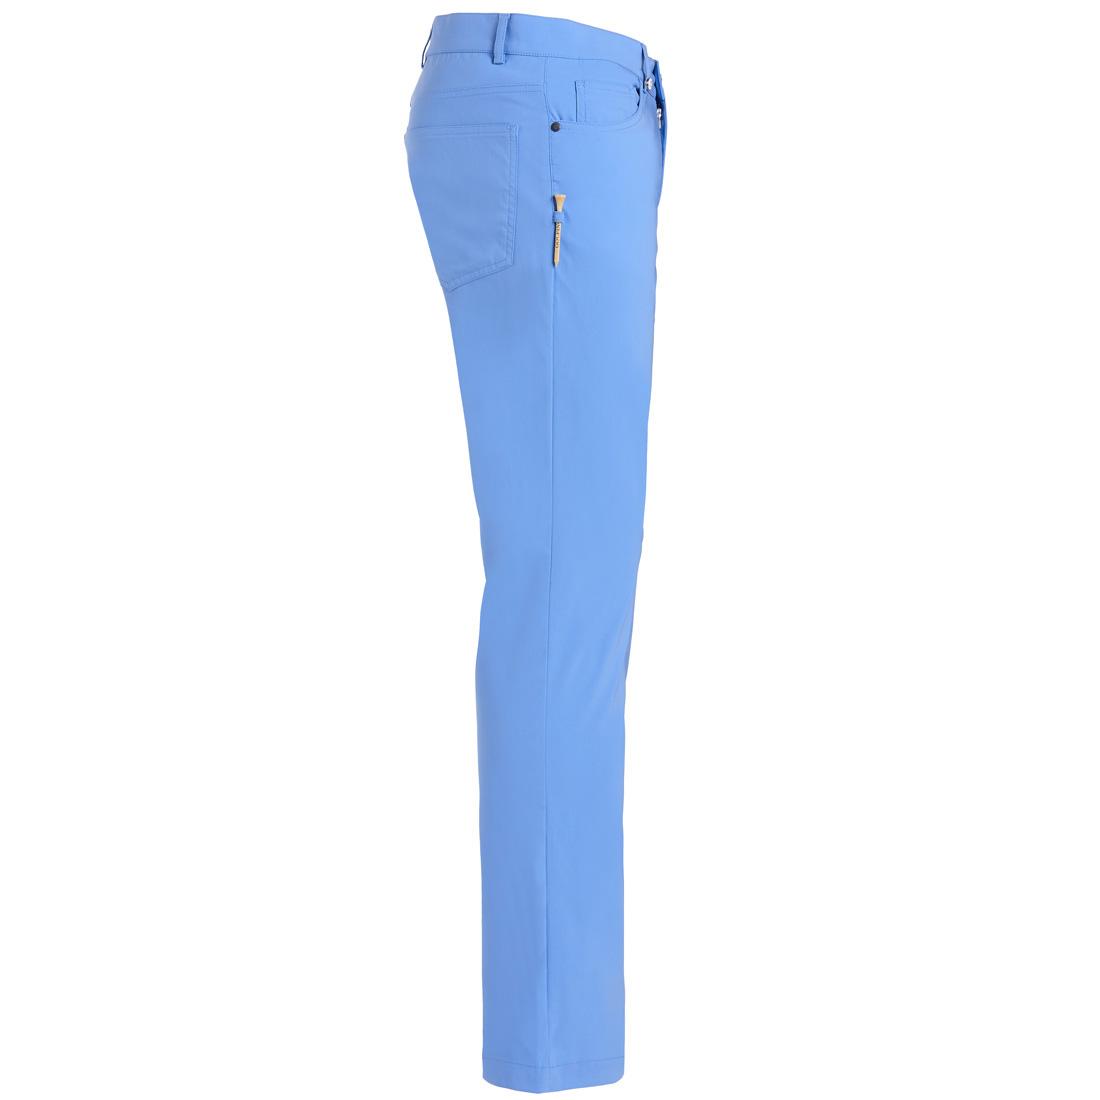 5-Pocket Stretch-Performance Golfhose in Slim Fit mit UV-Schutz